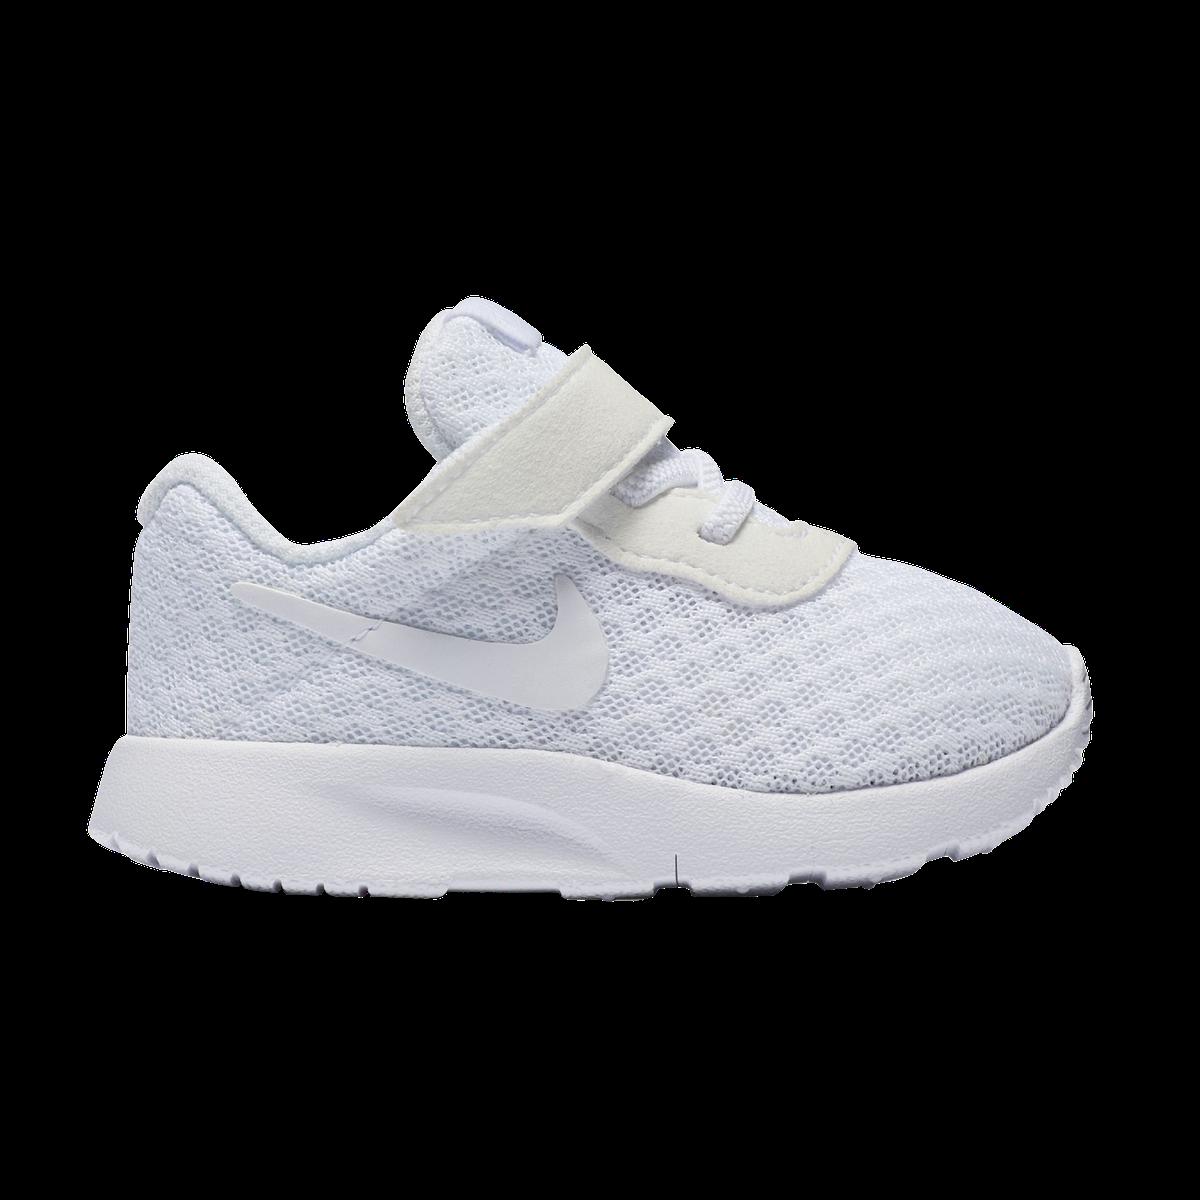 info for 5b98a 94c54 Nike Tanjun Tdv, Lasten vapaa-ajan kengät - Valkoinen - Lasten vapaa-ajan  kengät   XXL